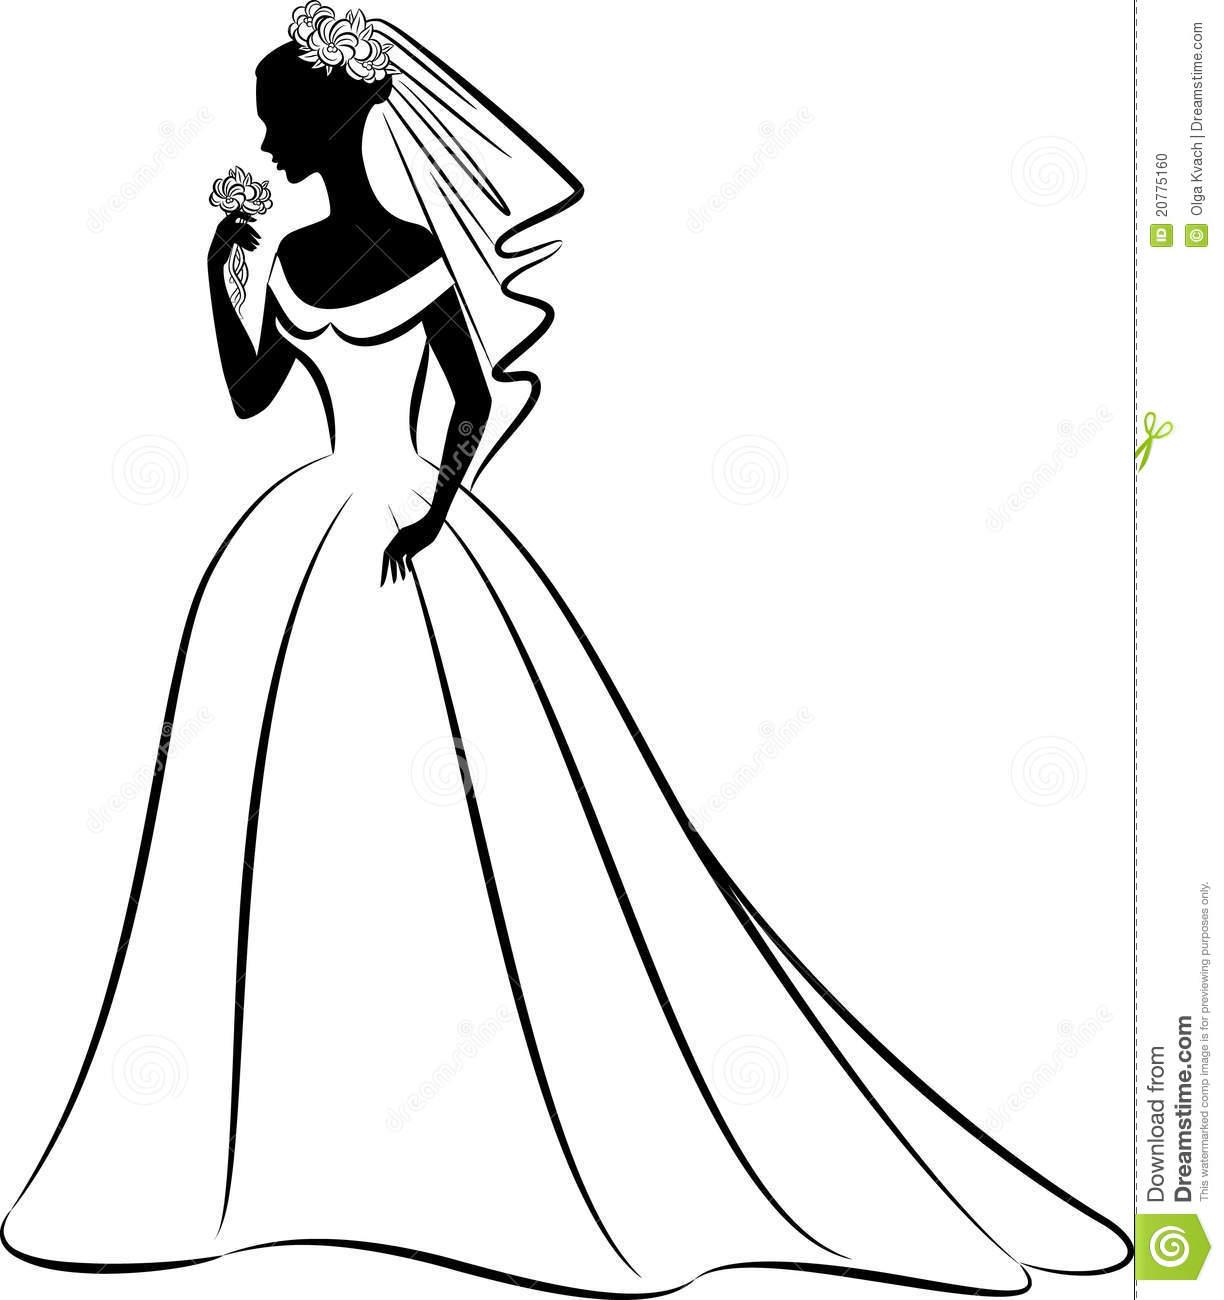 Wedding Dress Clipart Outline Clipart Panda Free Clipart Images